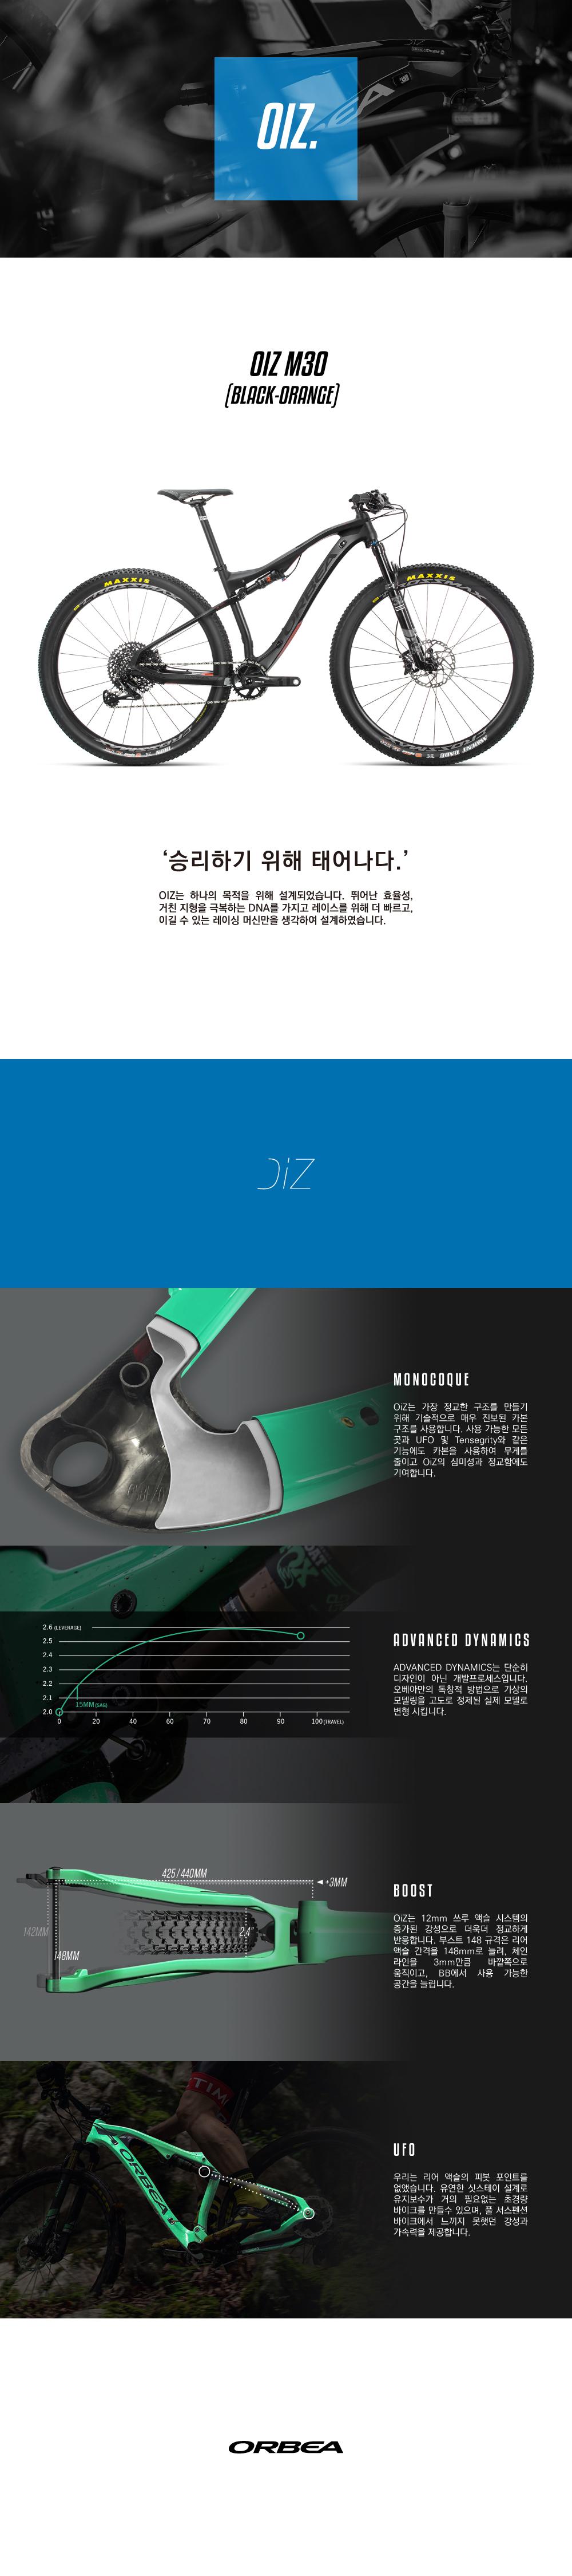 OIZ-M30_BLACK-ORANGE.jpg